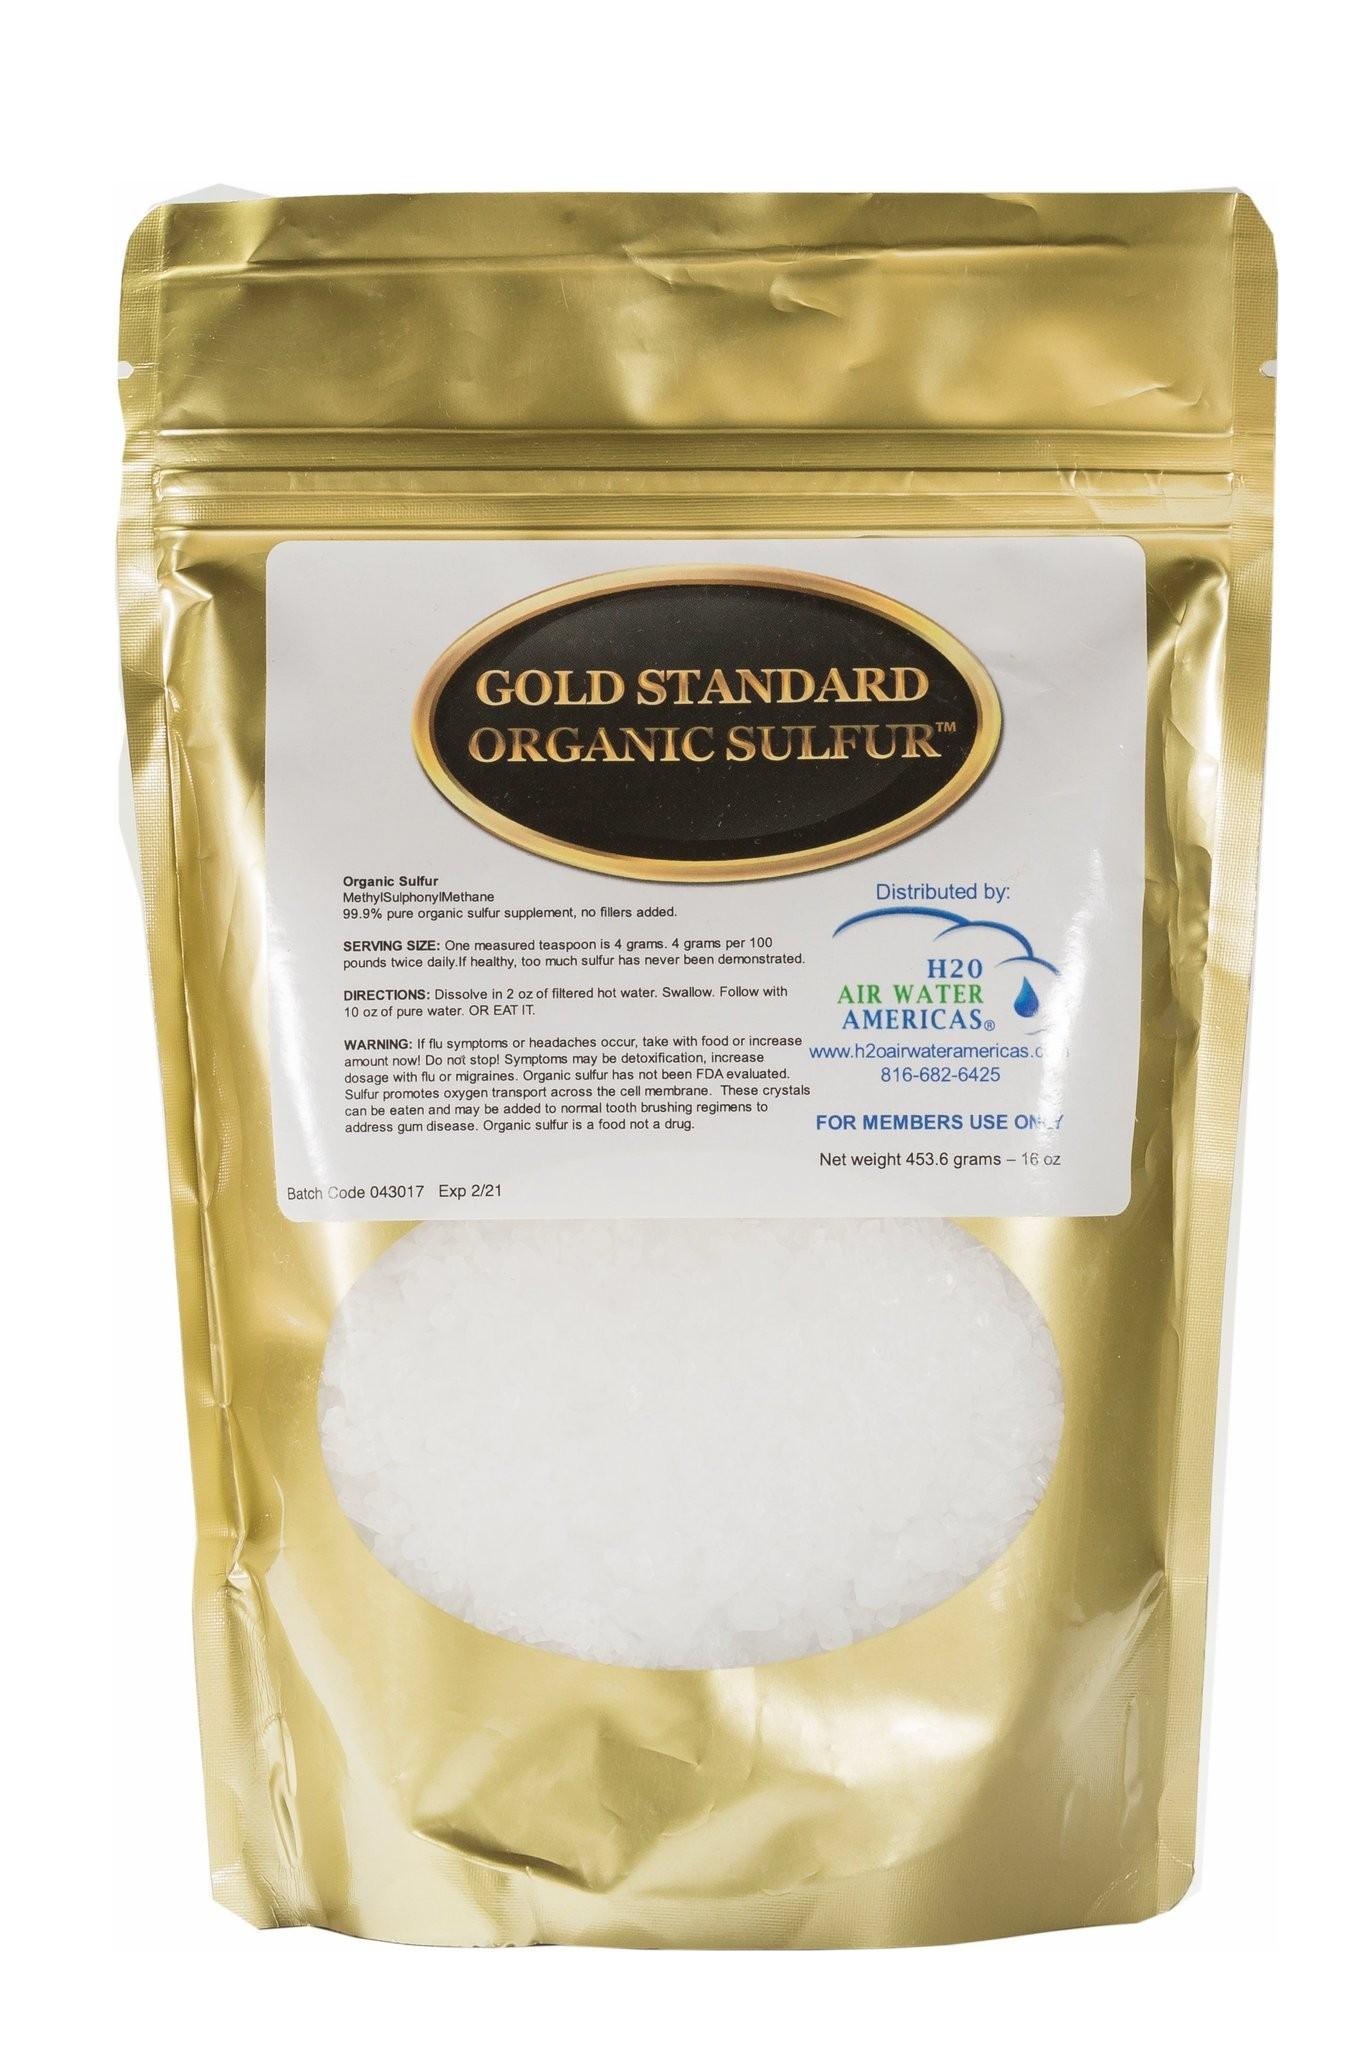 Gold Standard Organic Sulfur (Gold Standard) 1 pound - New ...